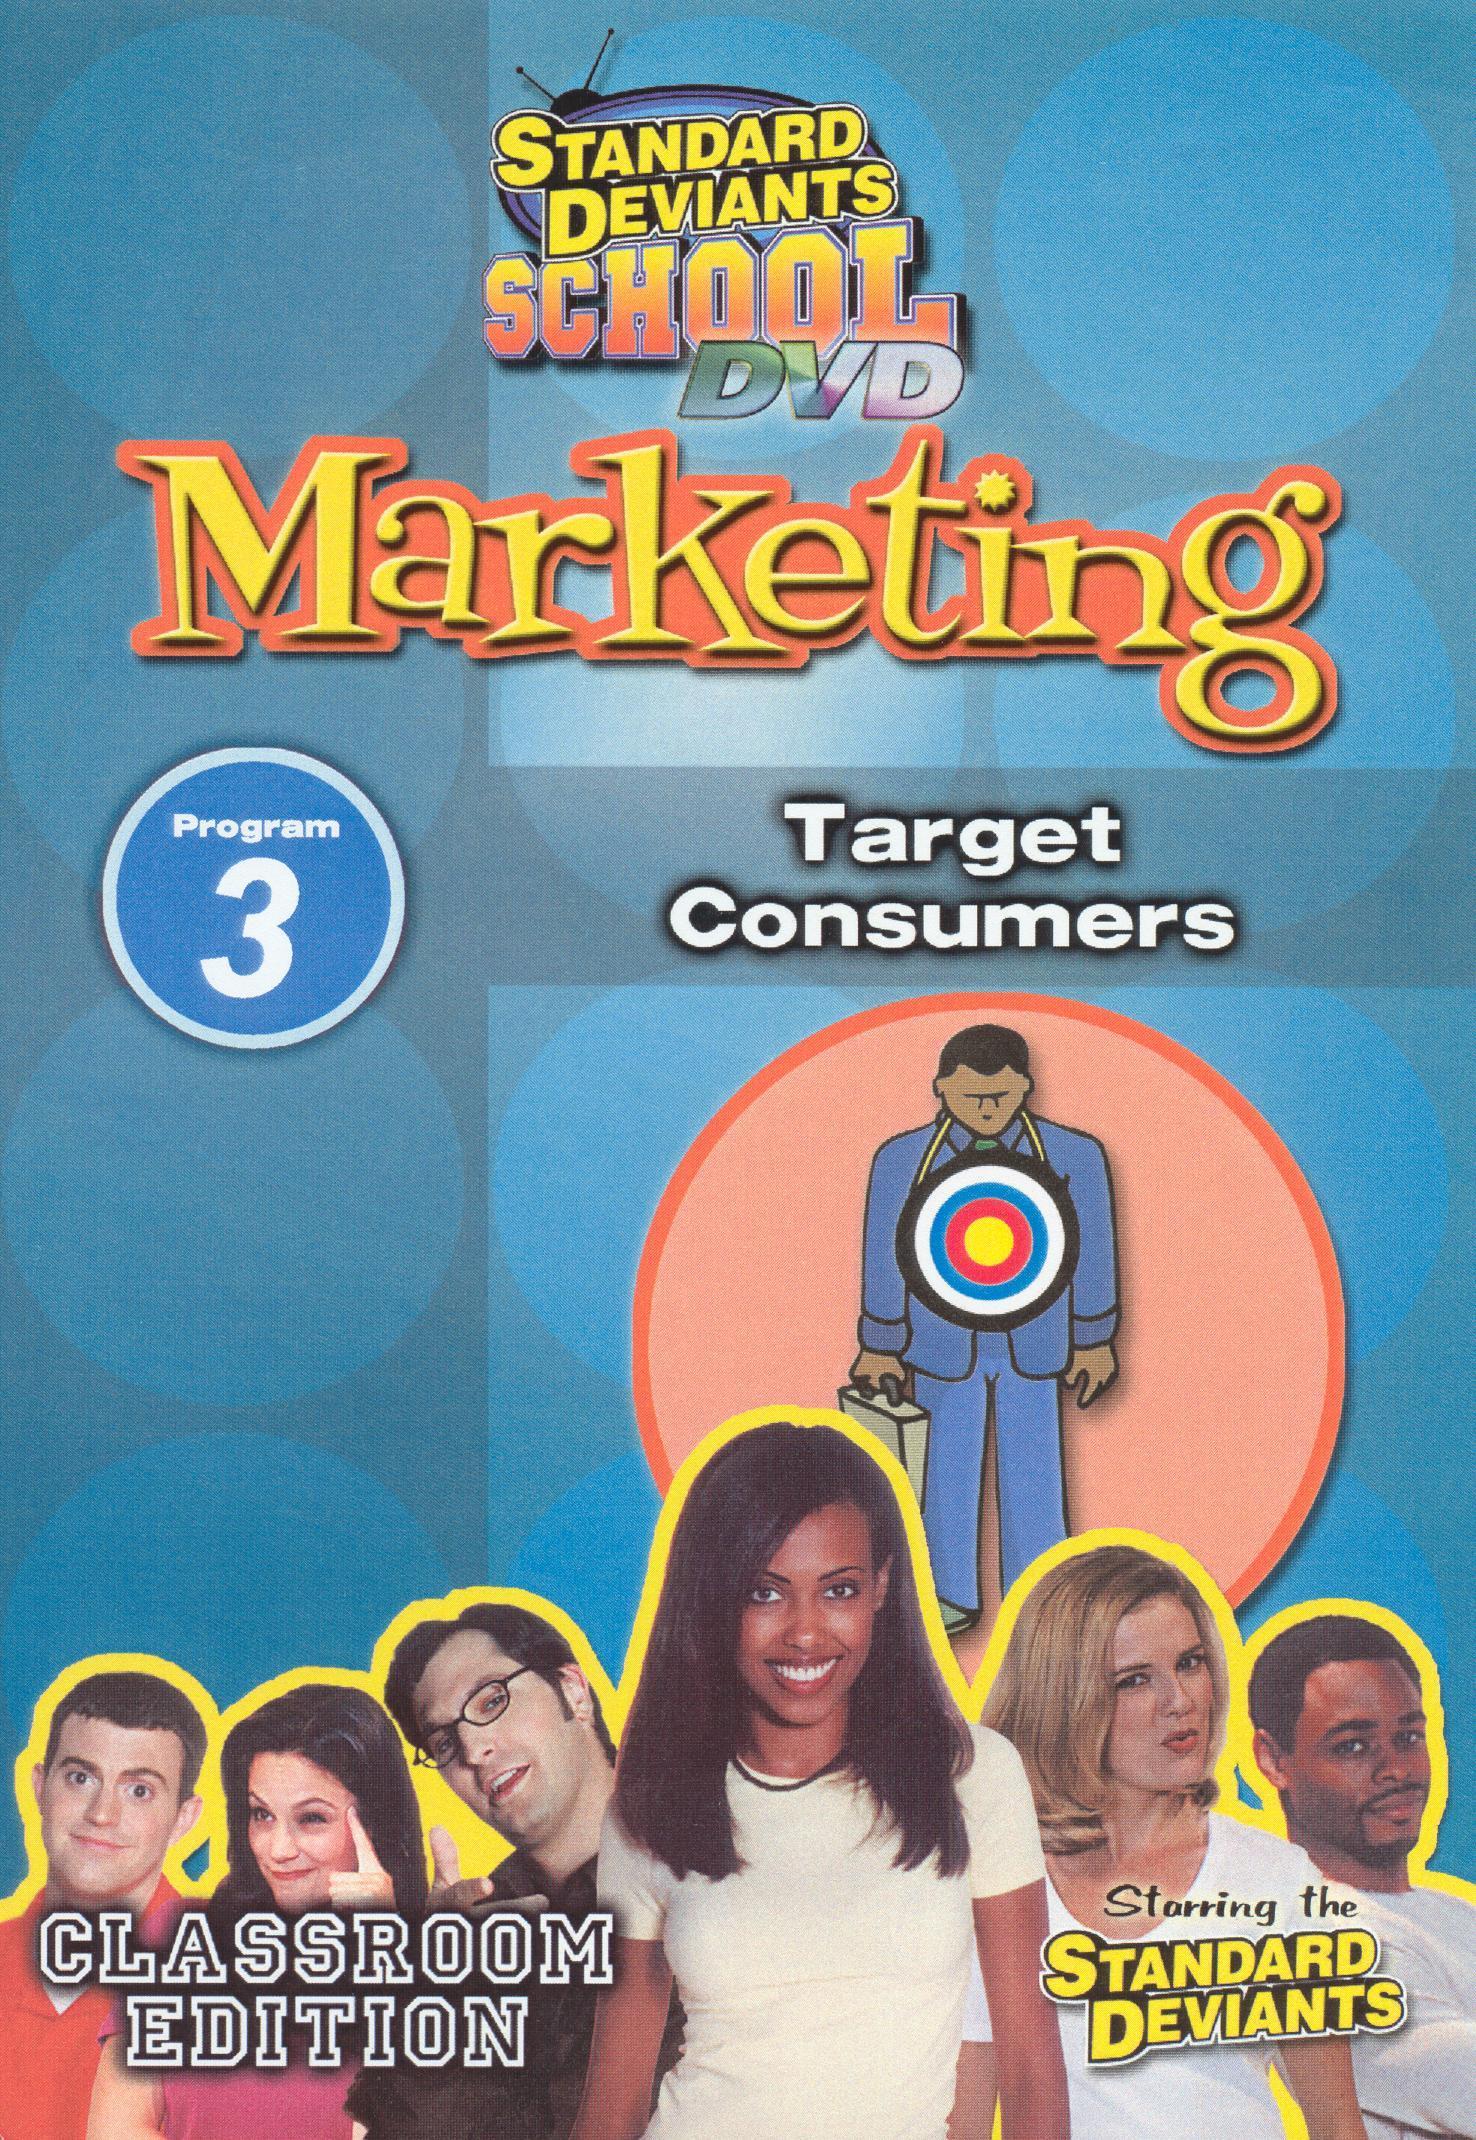 Standard Deviants School: Marketing, Program 3 - Target Consumers